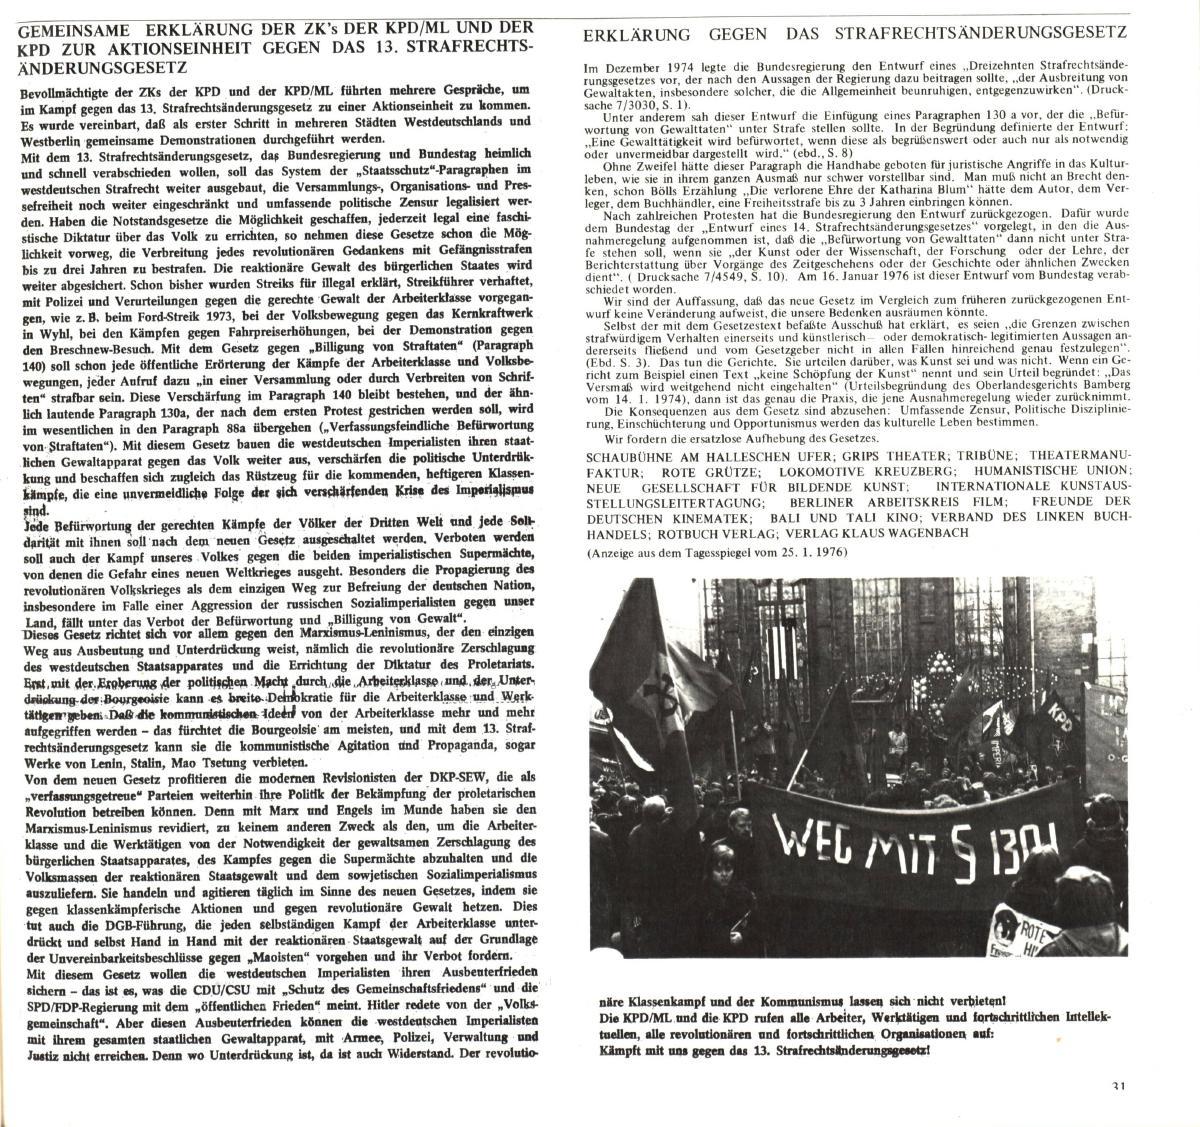 REP_VLB_1976_Die_Zensurgesetze_32